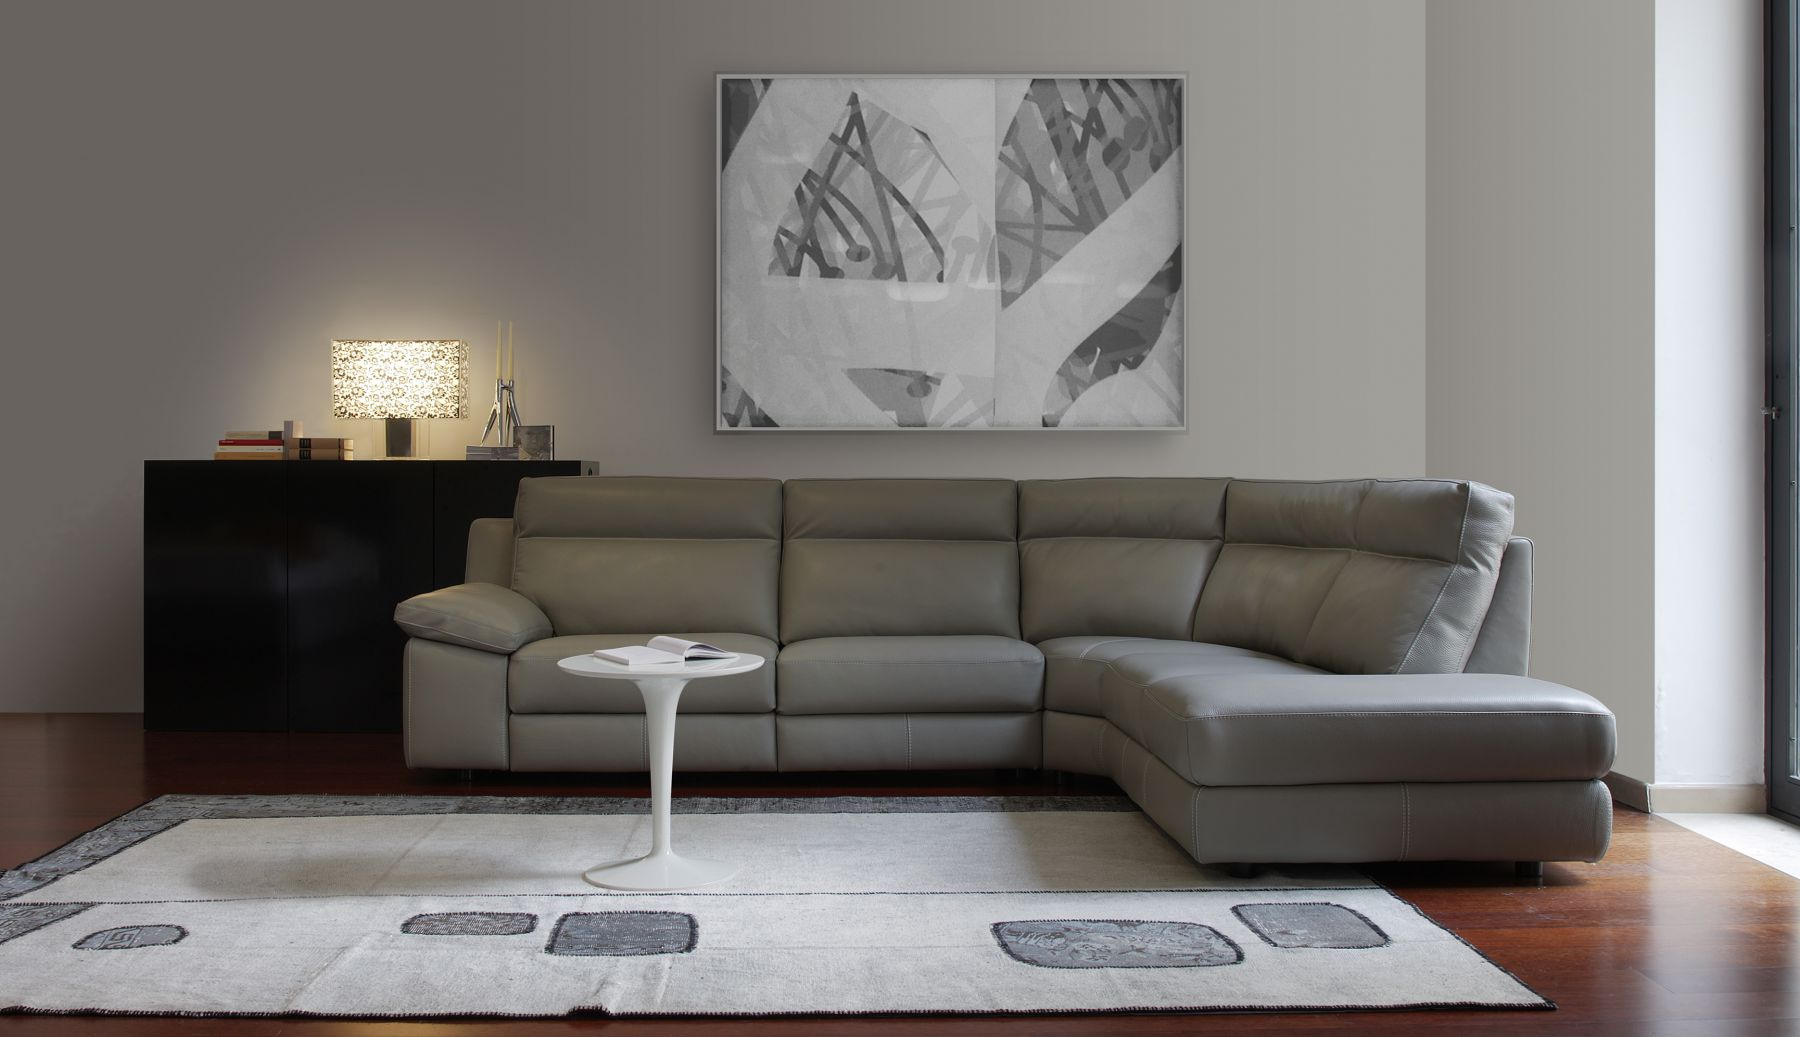 calia italia taylor. Black Bedroom Furniture Sets. Home Design Ideas